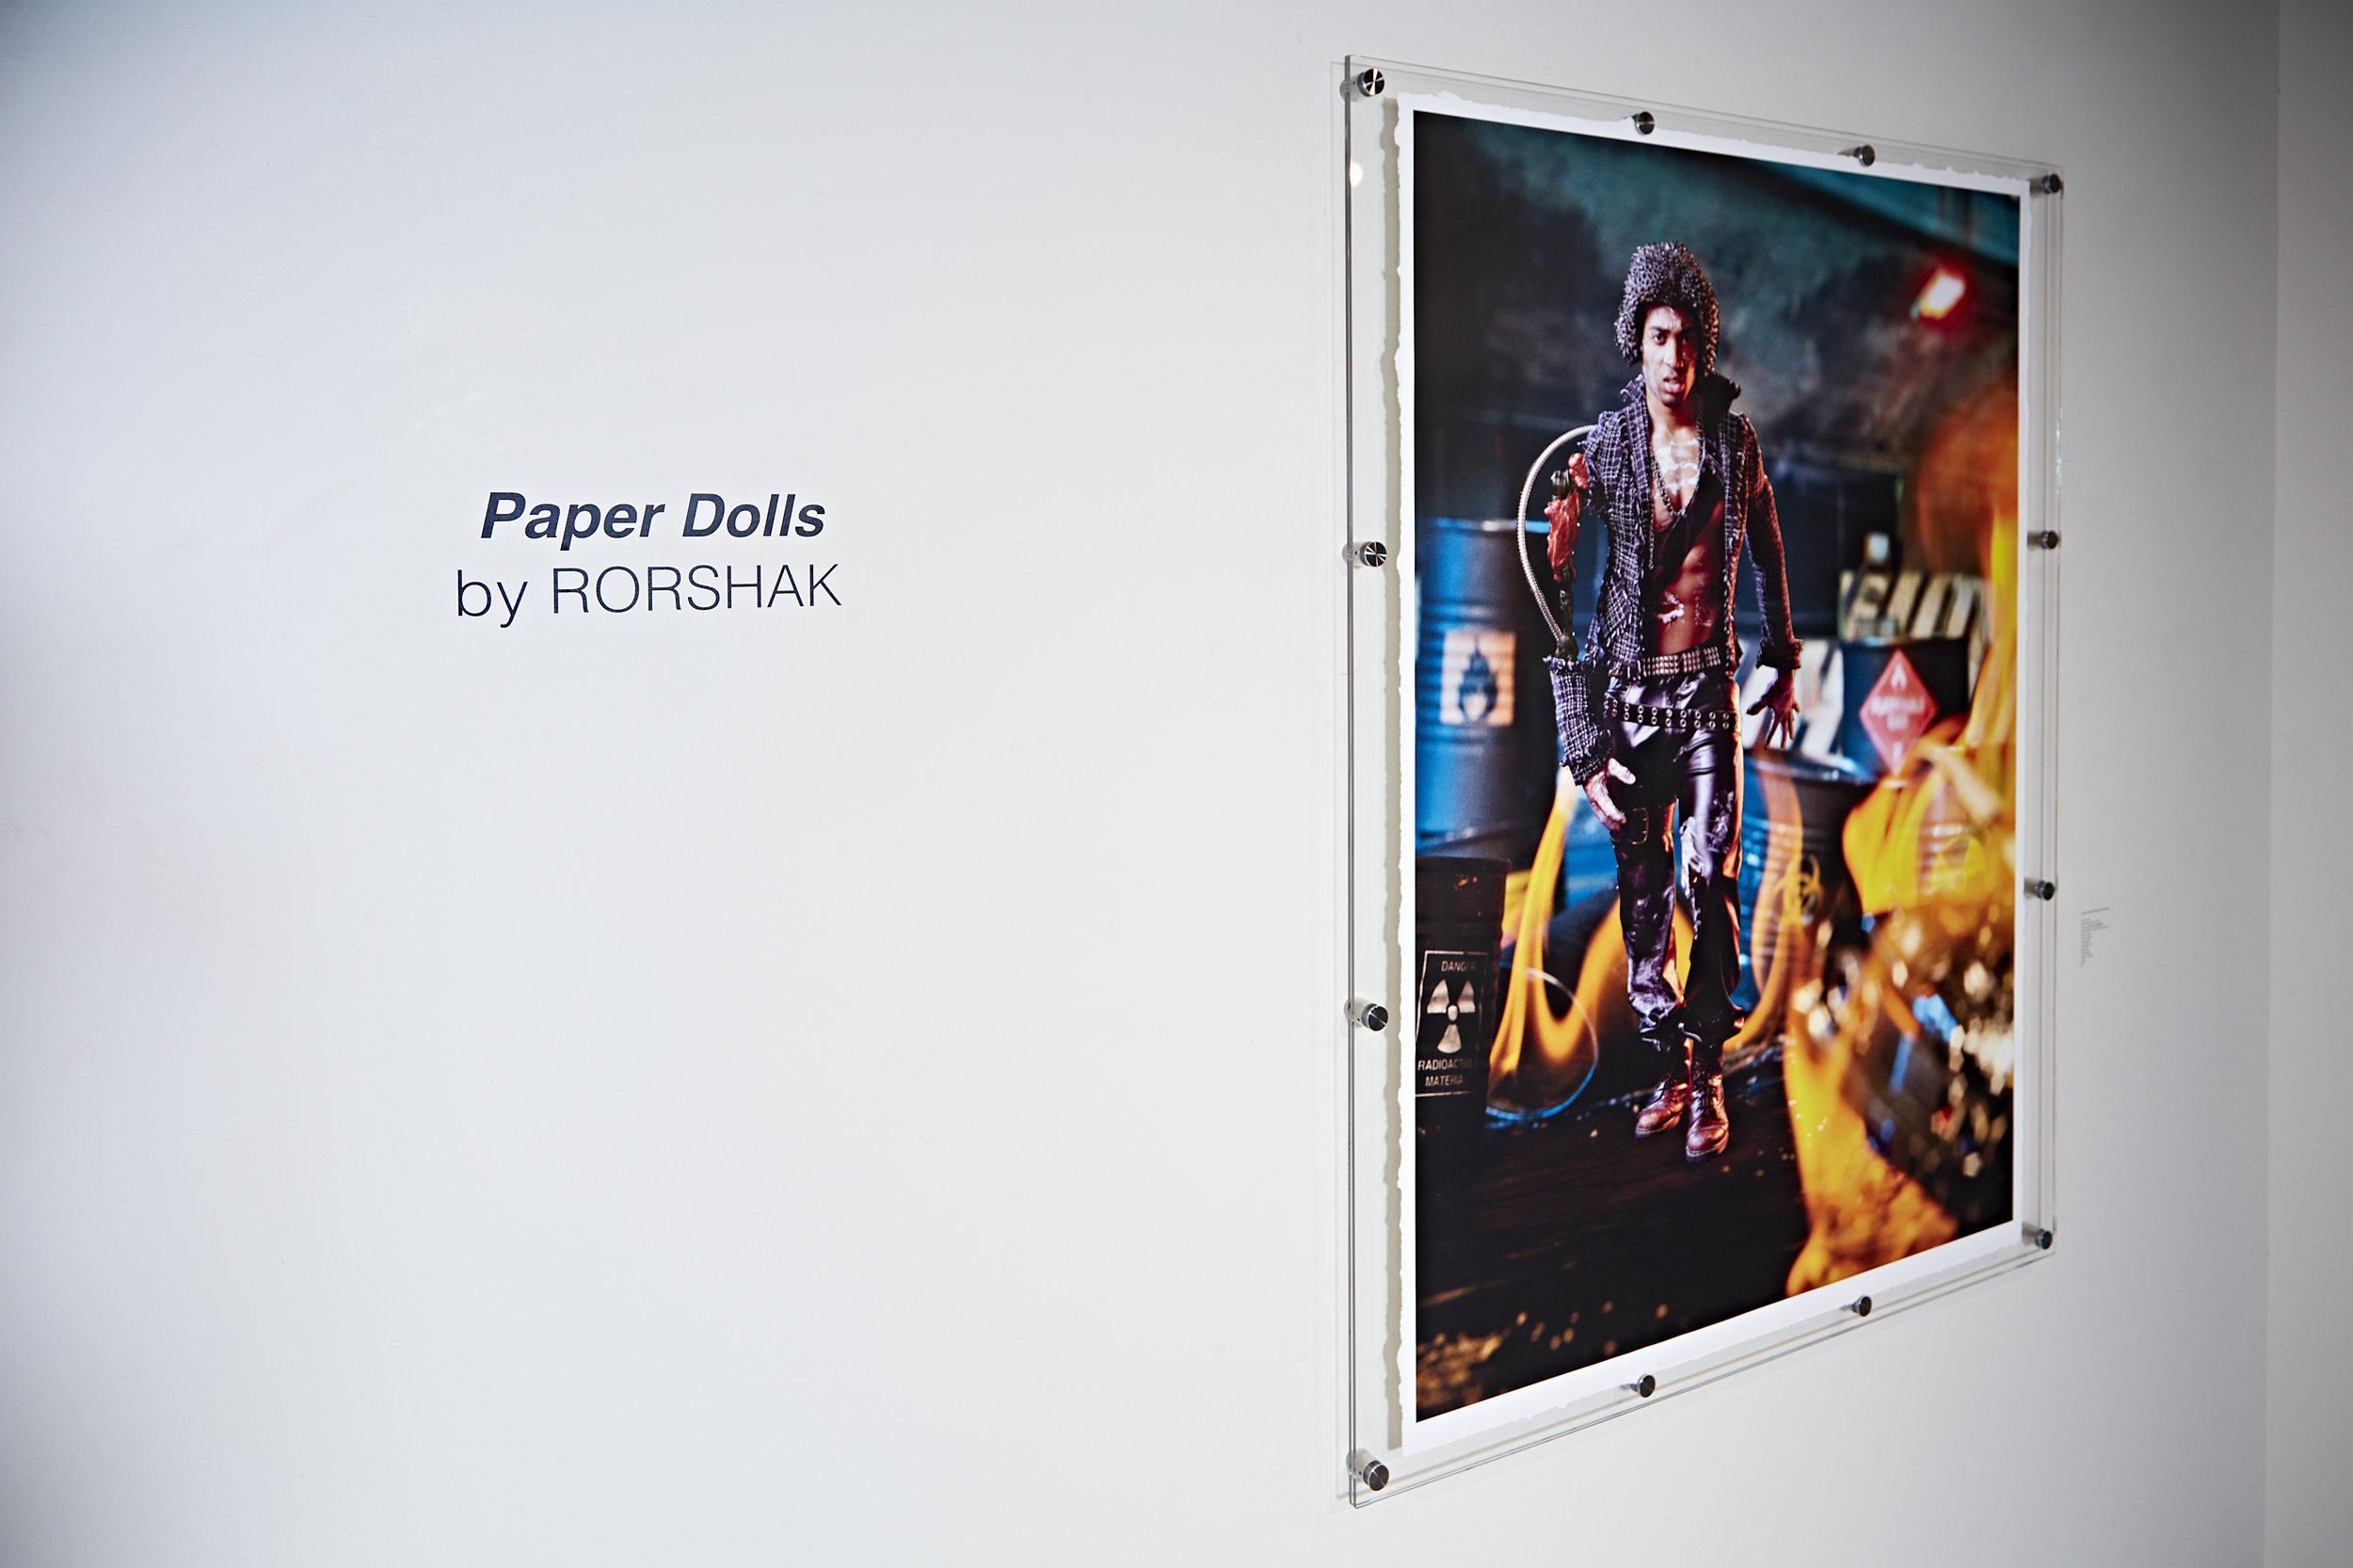 paper_dolls_exhibit_115.jpg